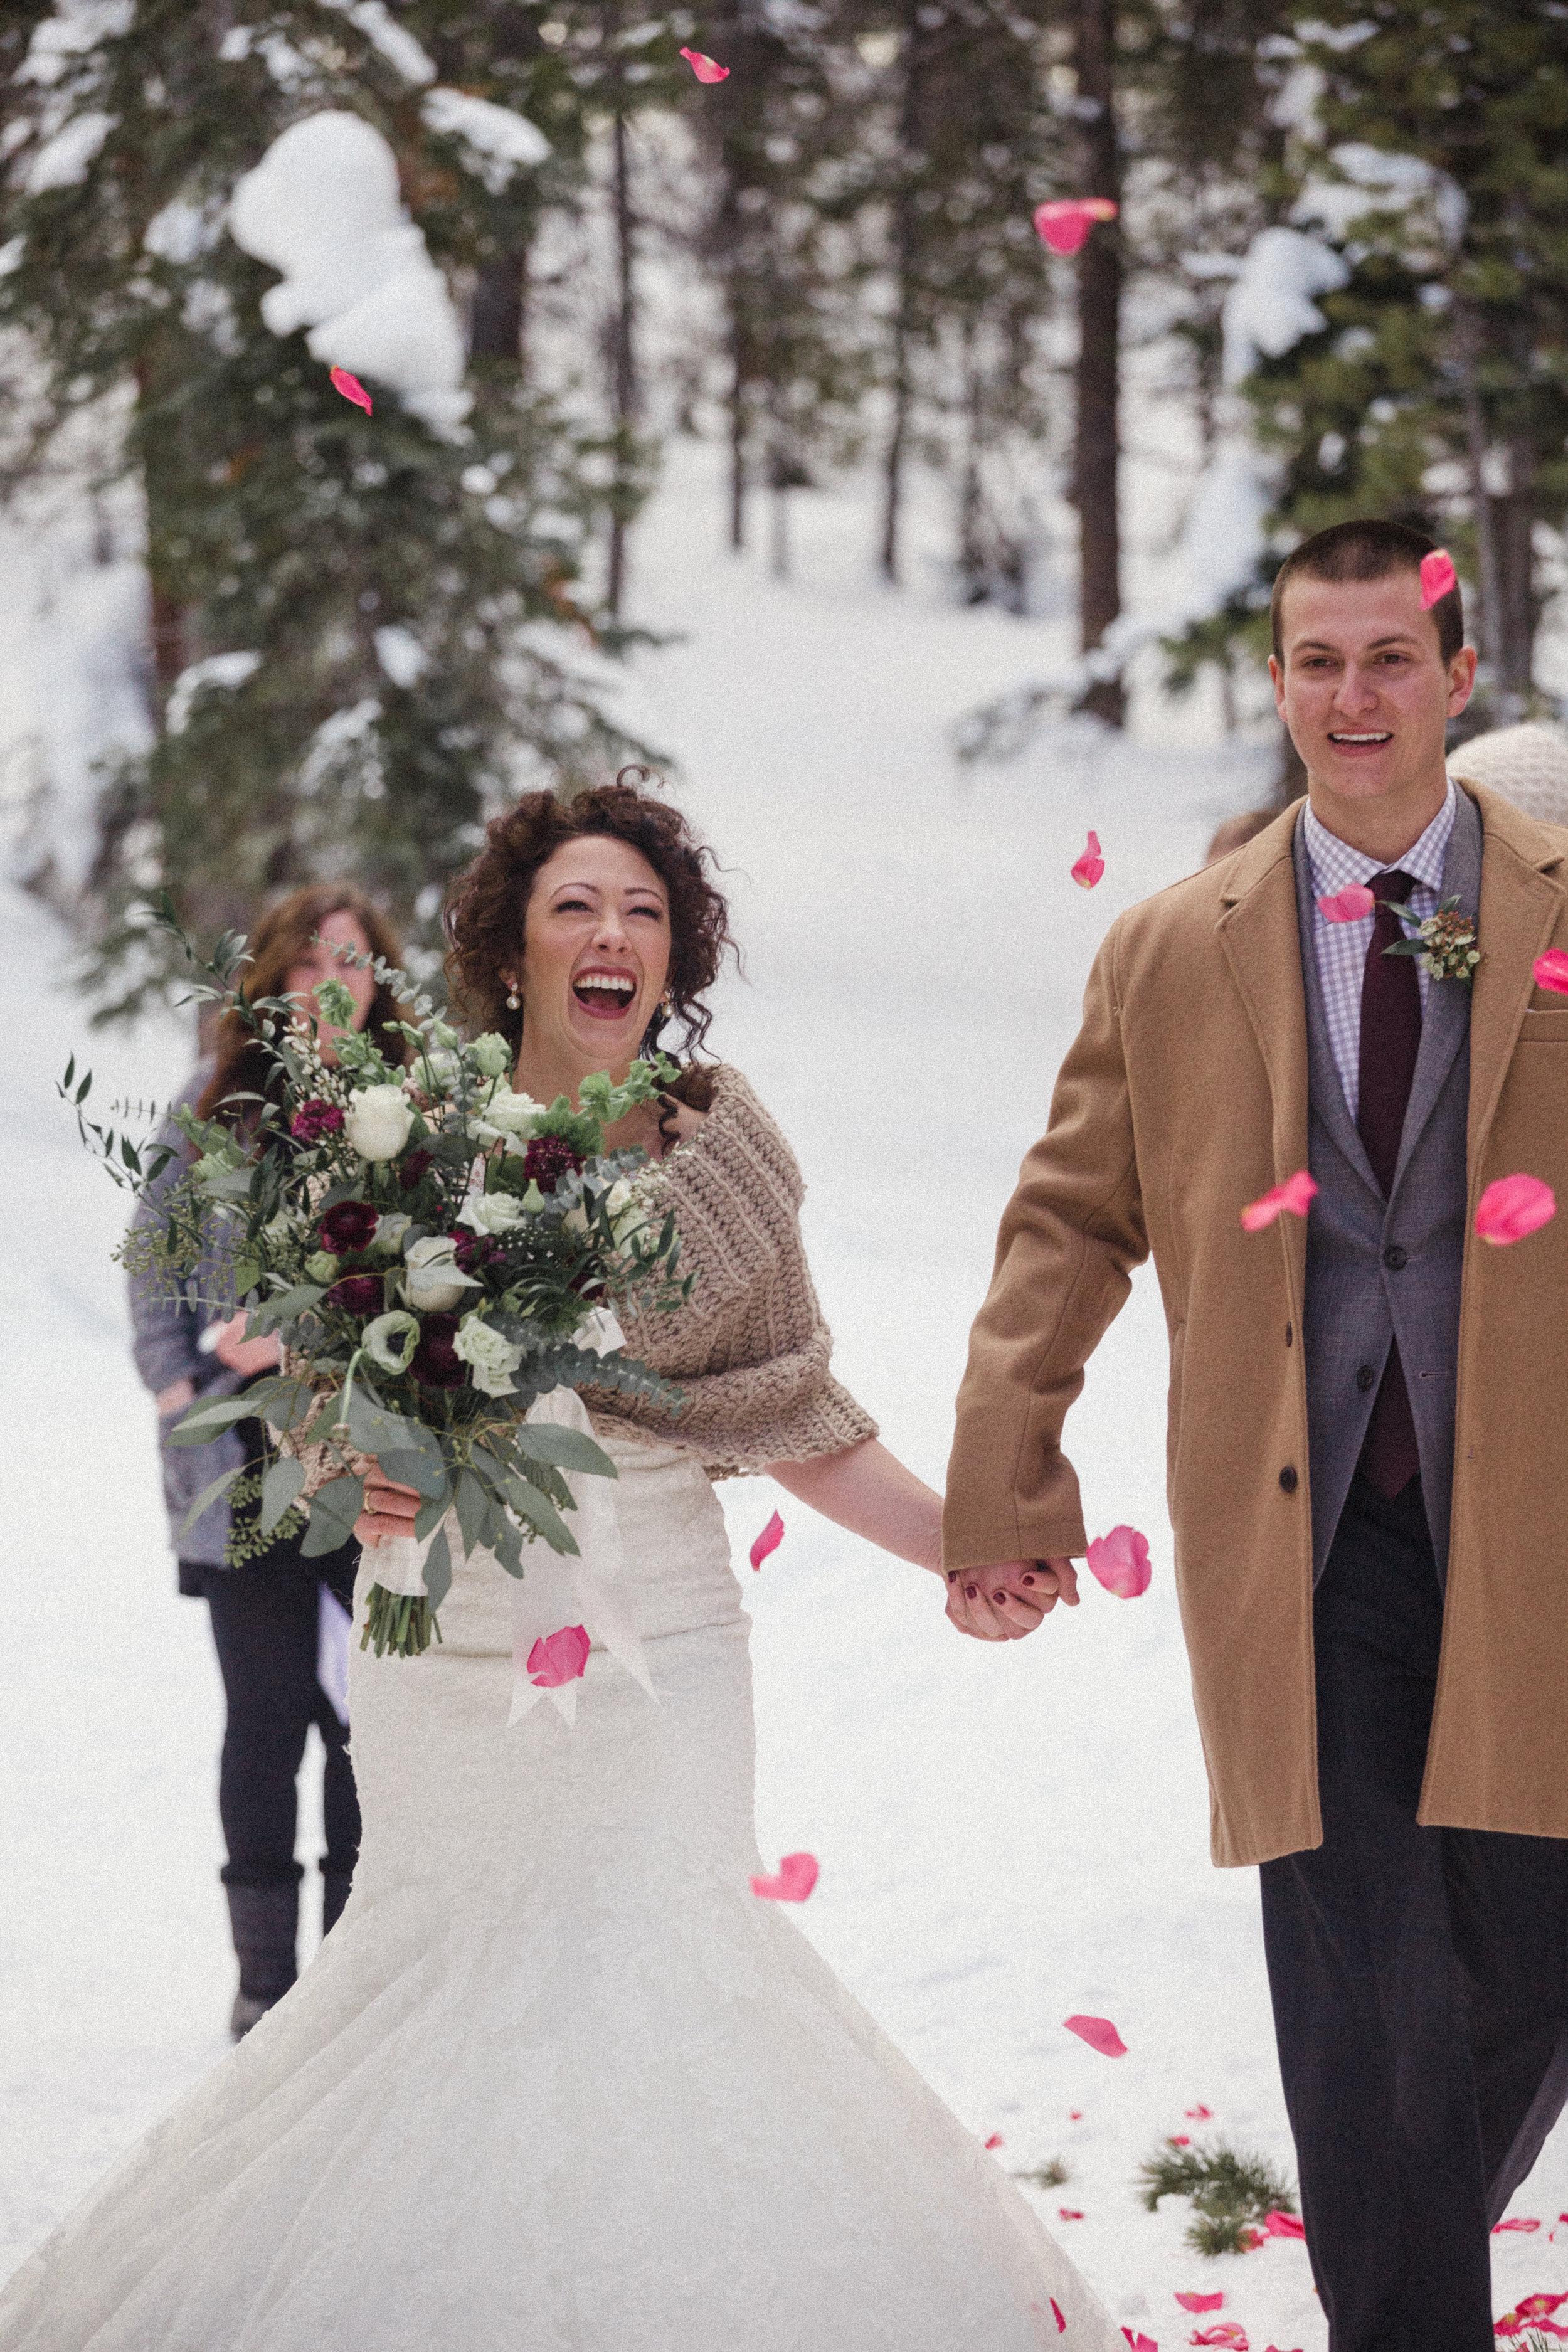 rose-petals-wedding-winter-park